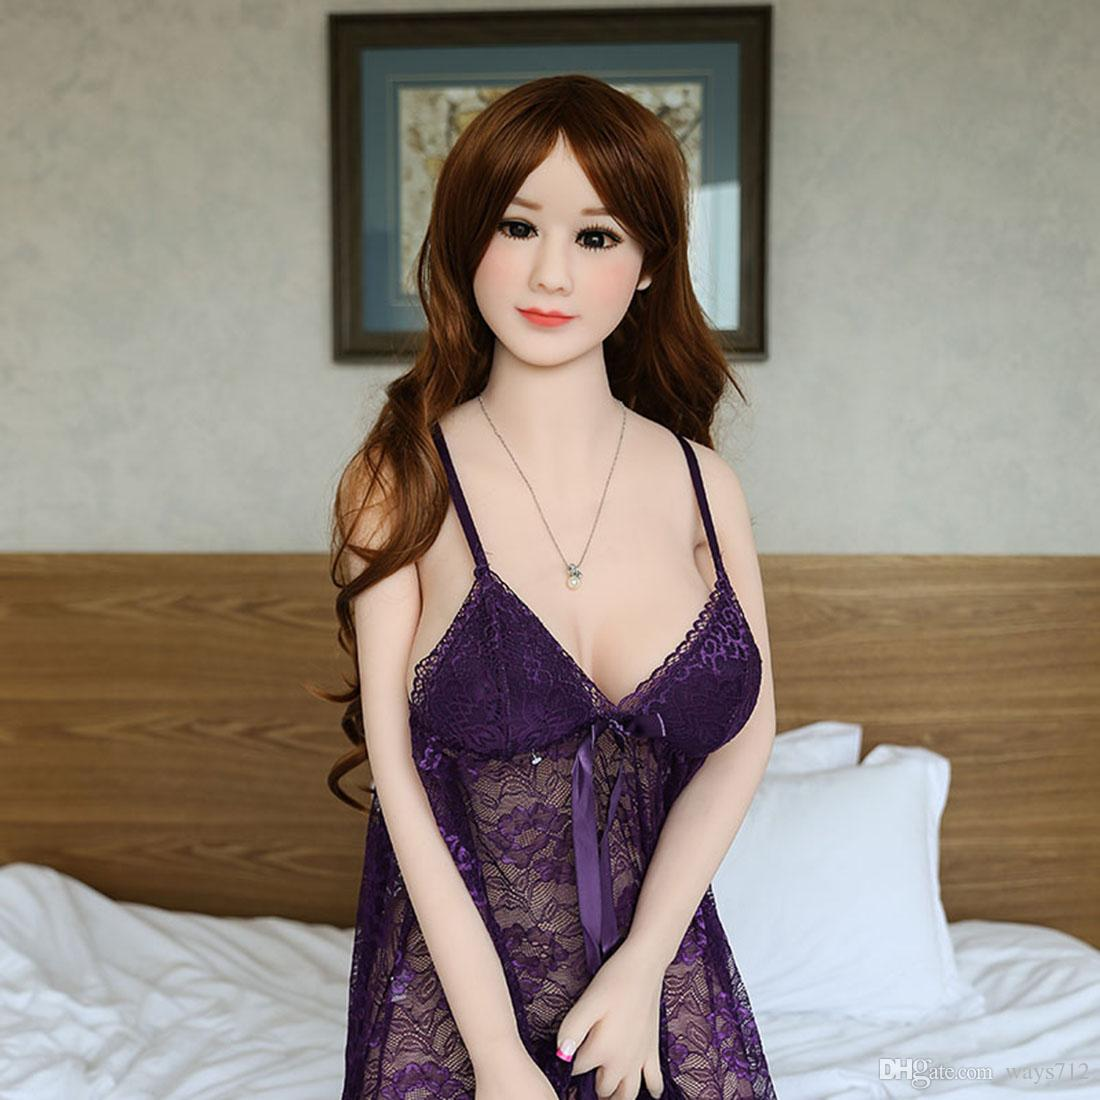 165cm Full Size Flesh TPE Lifelike Big Boobs Love Dolls Realistic Sex Doll For Man Masturbation With Large Breast